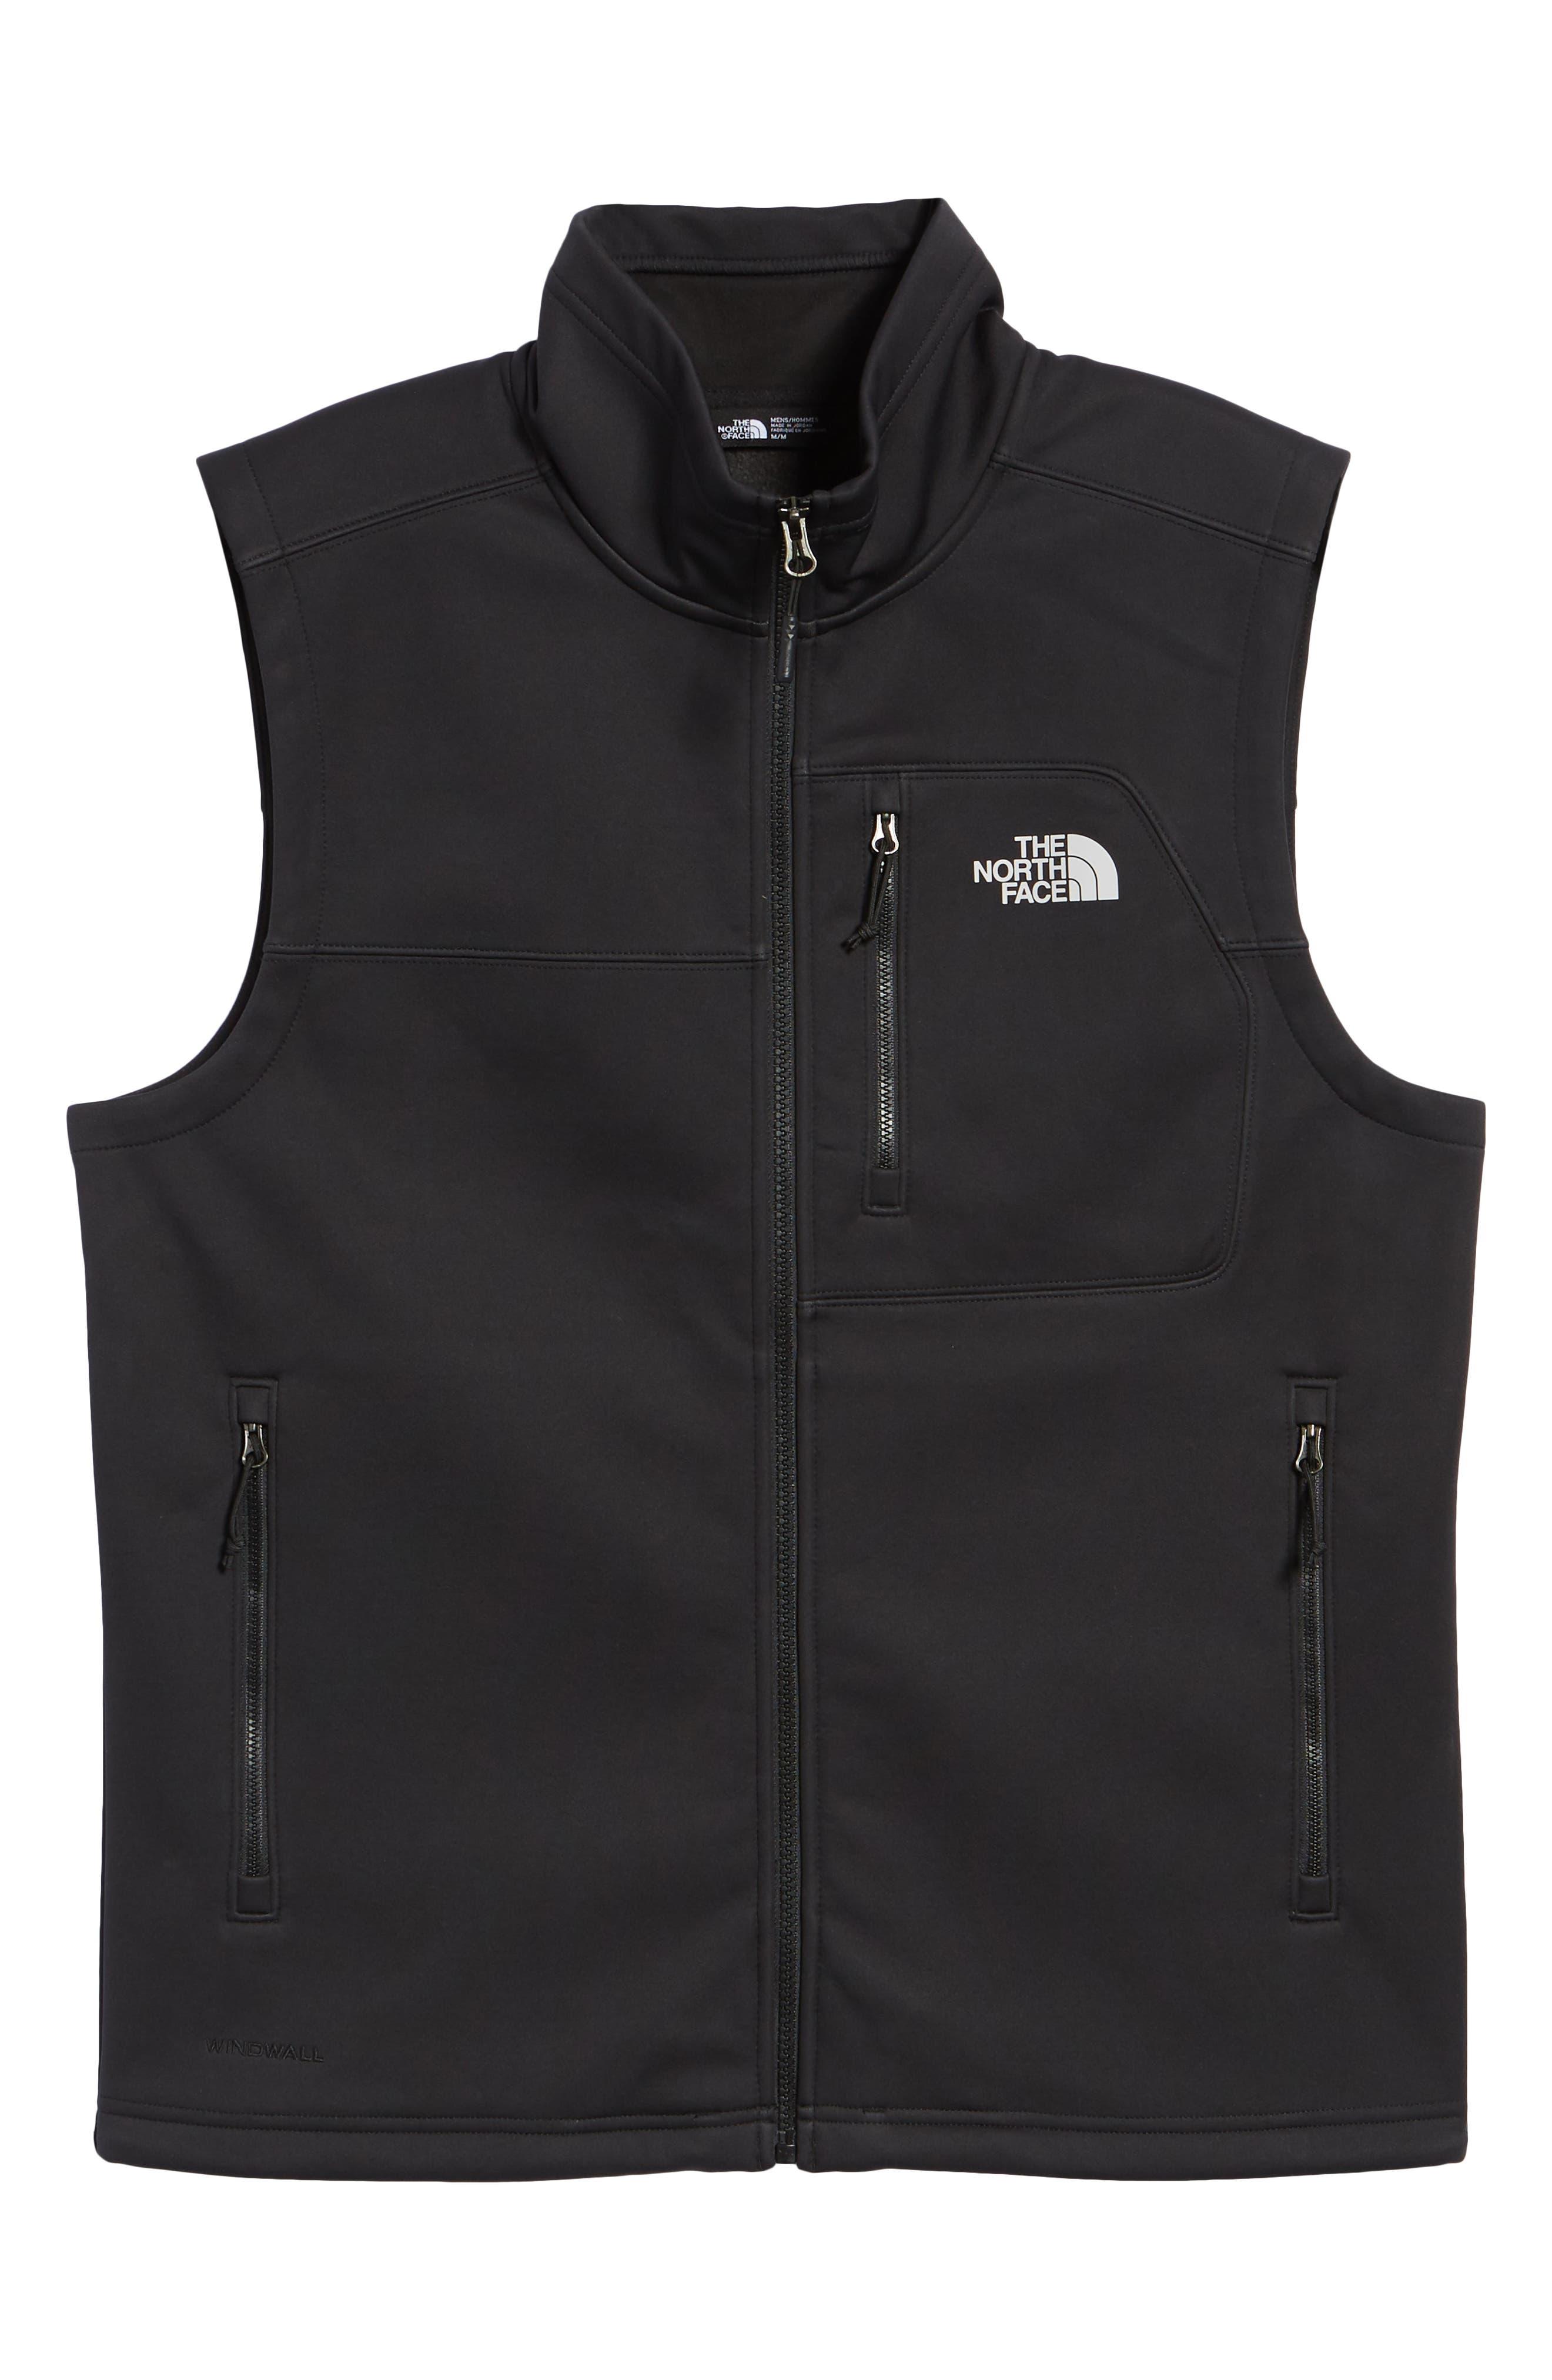 Apex Risor Vest,                             Alternate thumbnail 6, color,                             TNF BLACK/ TNF BLACK